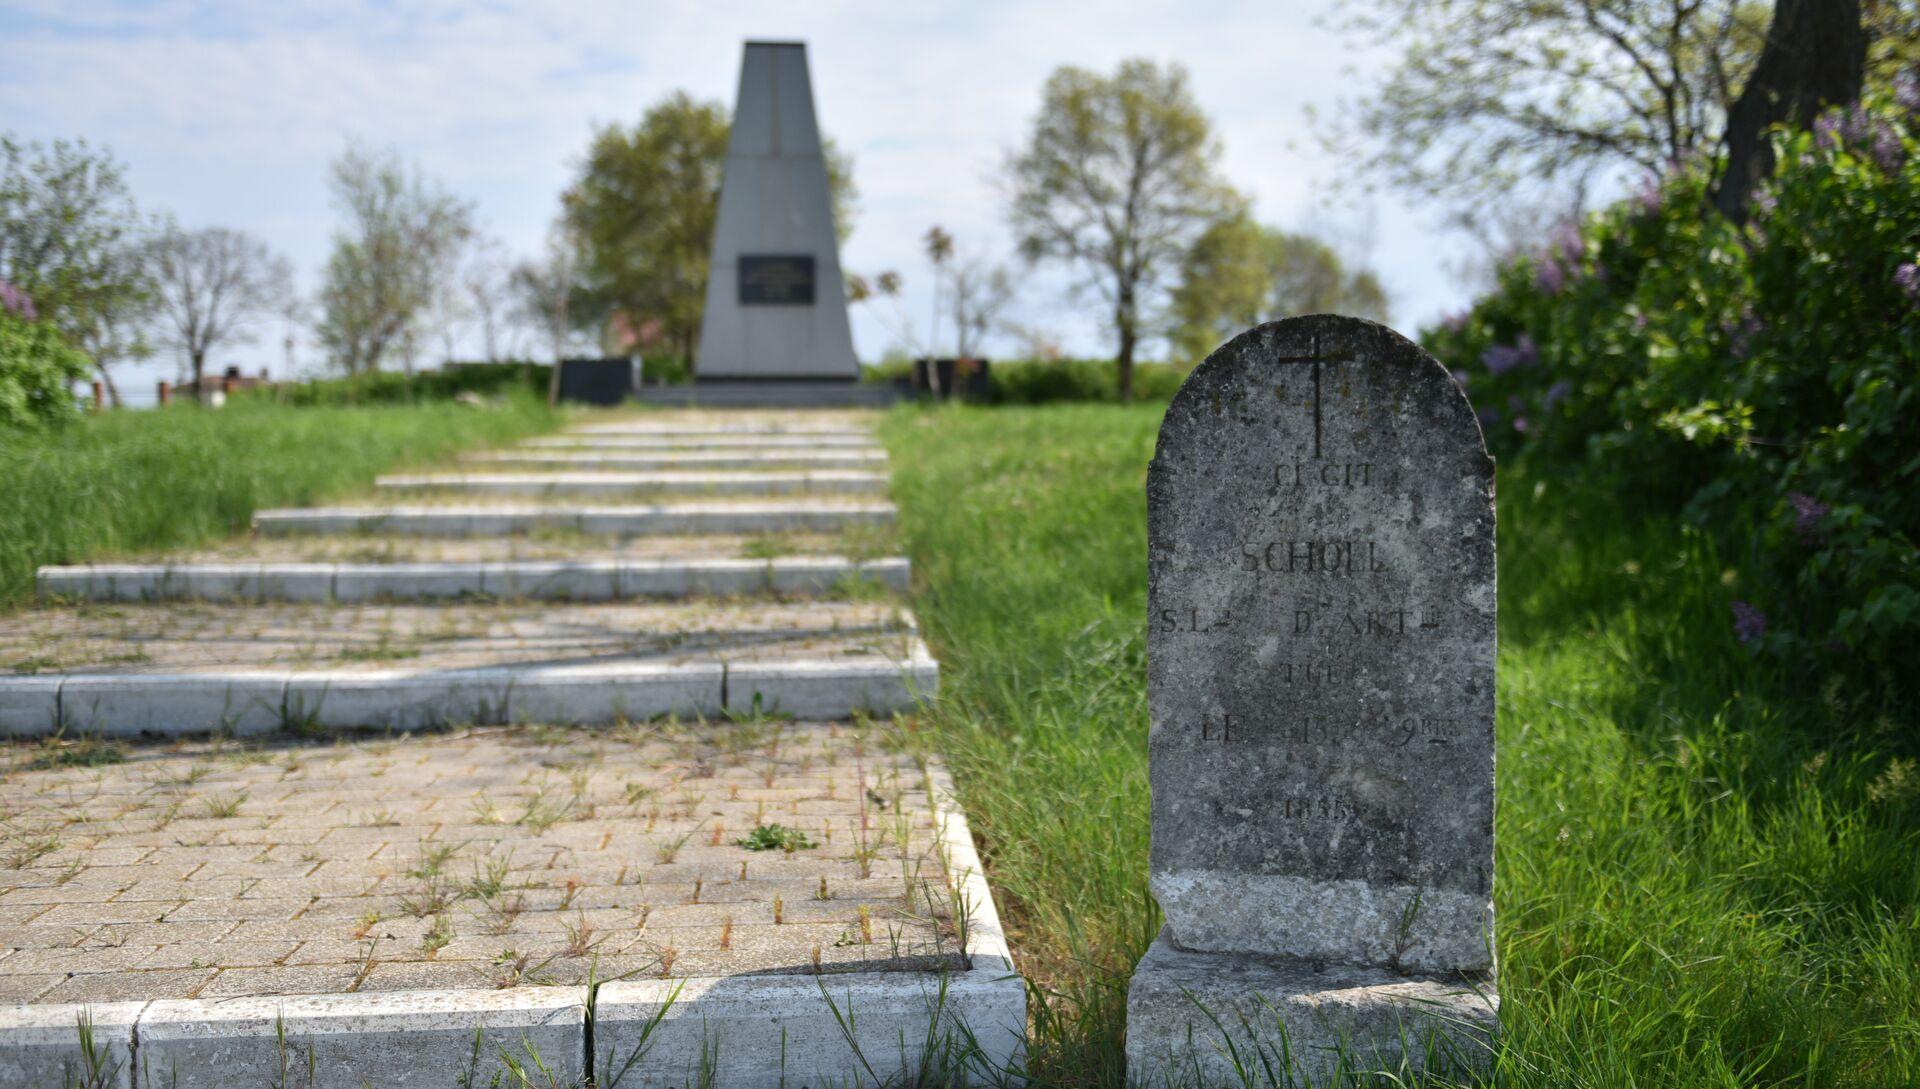 Французское кладбище в Севастополе - РИА Новости, 1920, 14.09.2020